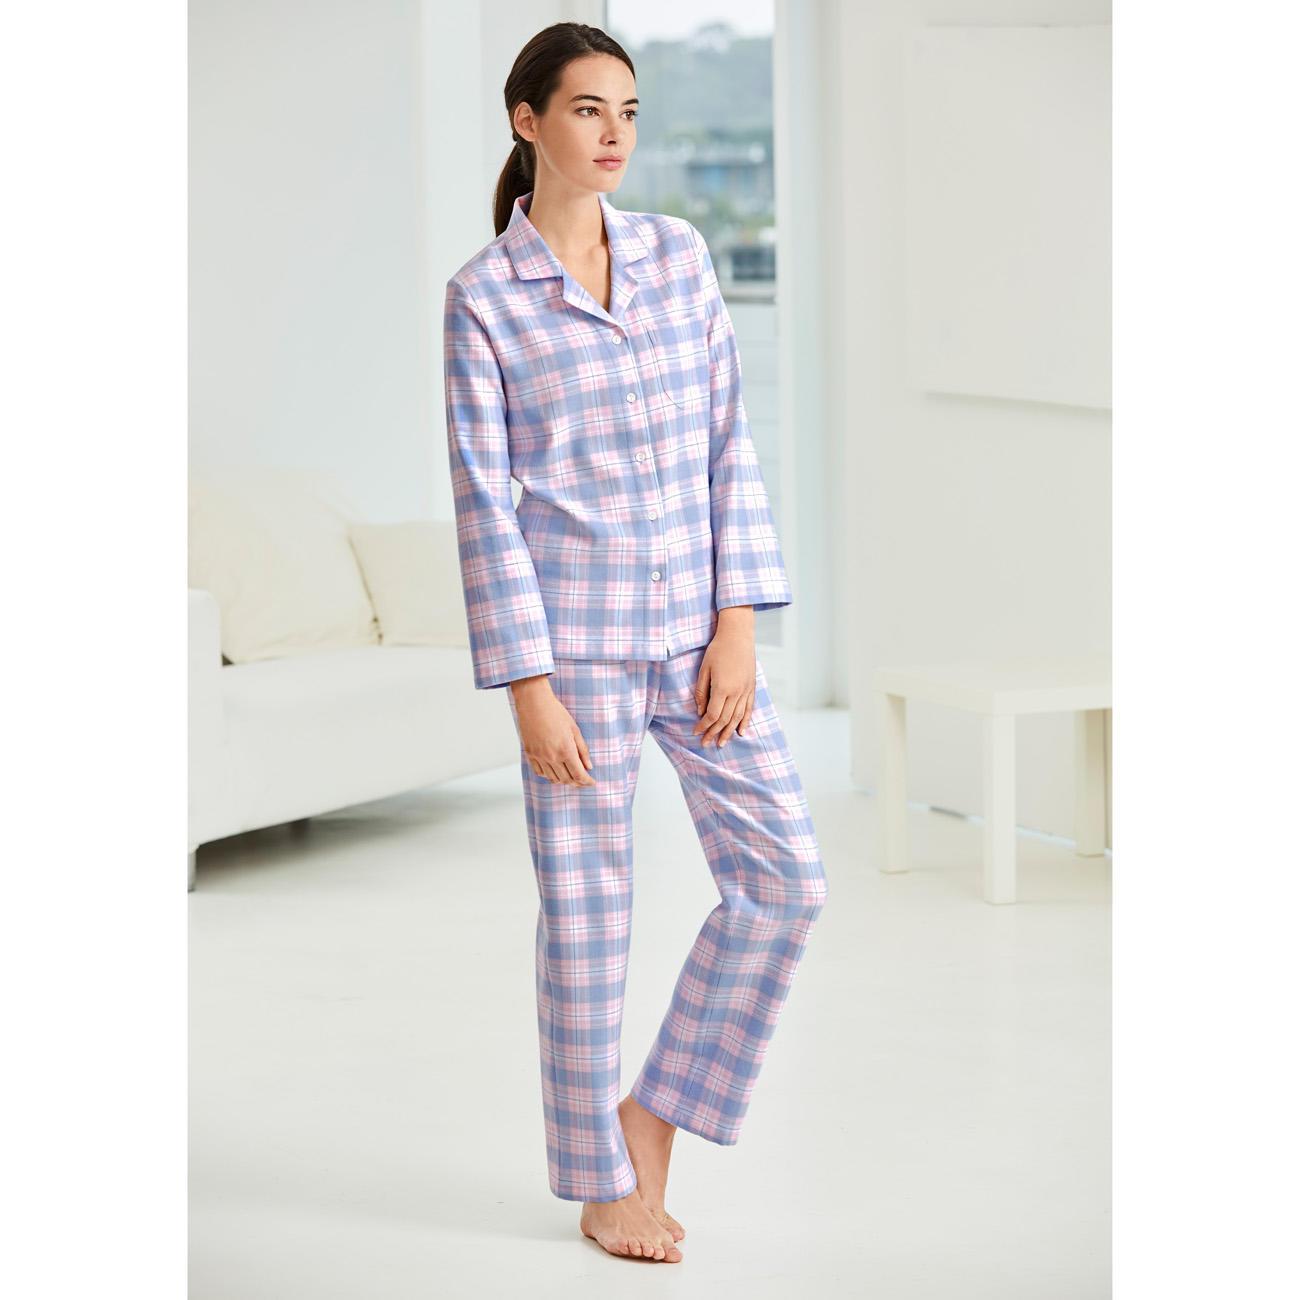 Pyjama carreaux en flanelle novila pas cher pro idee for Pyjama a carreaux